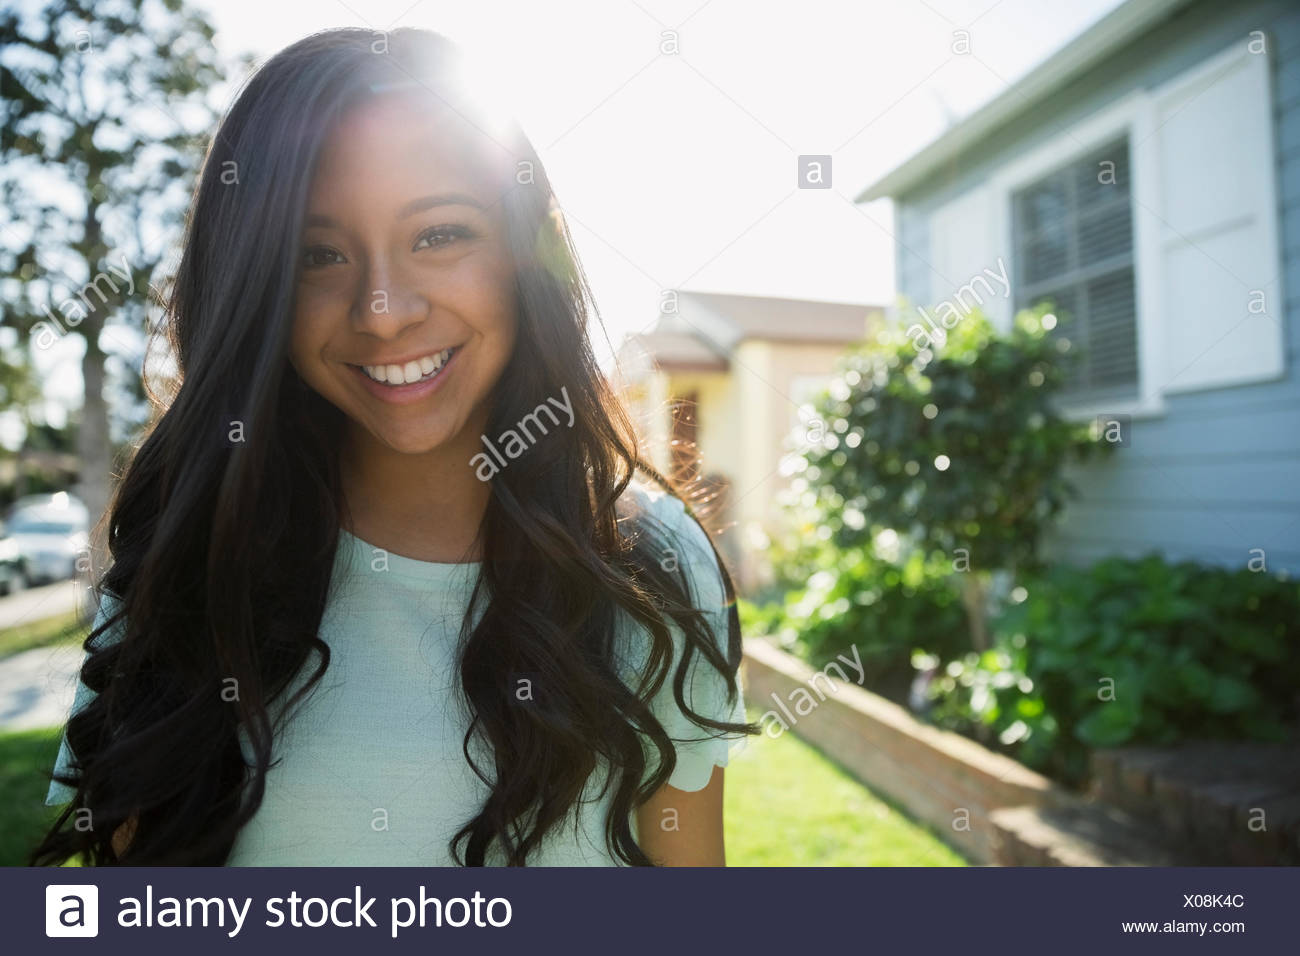 Porträt, Lächeln sonnigen Vorgarten Brünette Teenager-Mädchen Stockbild